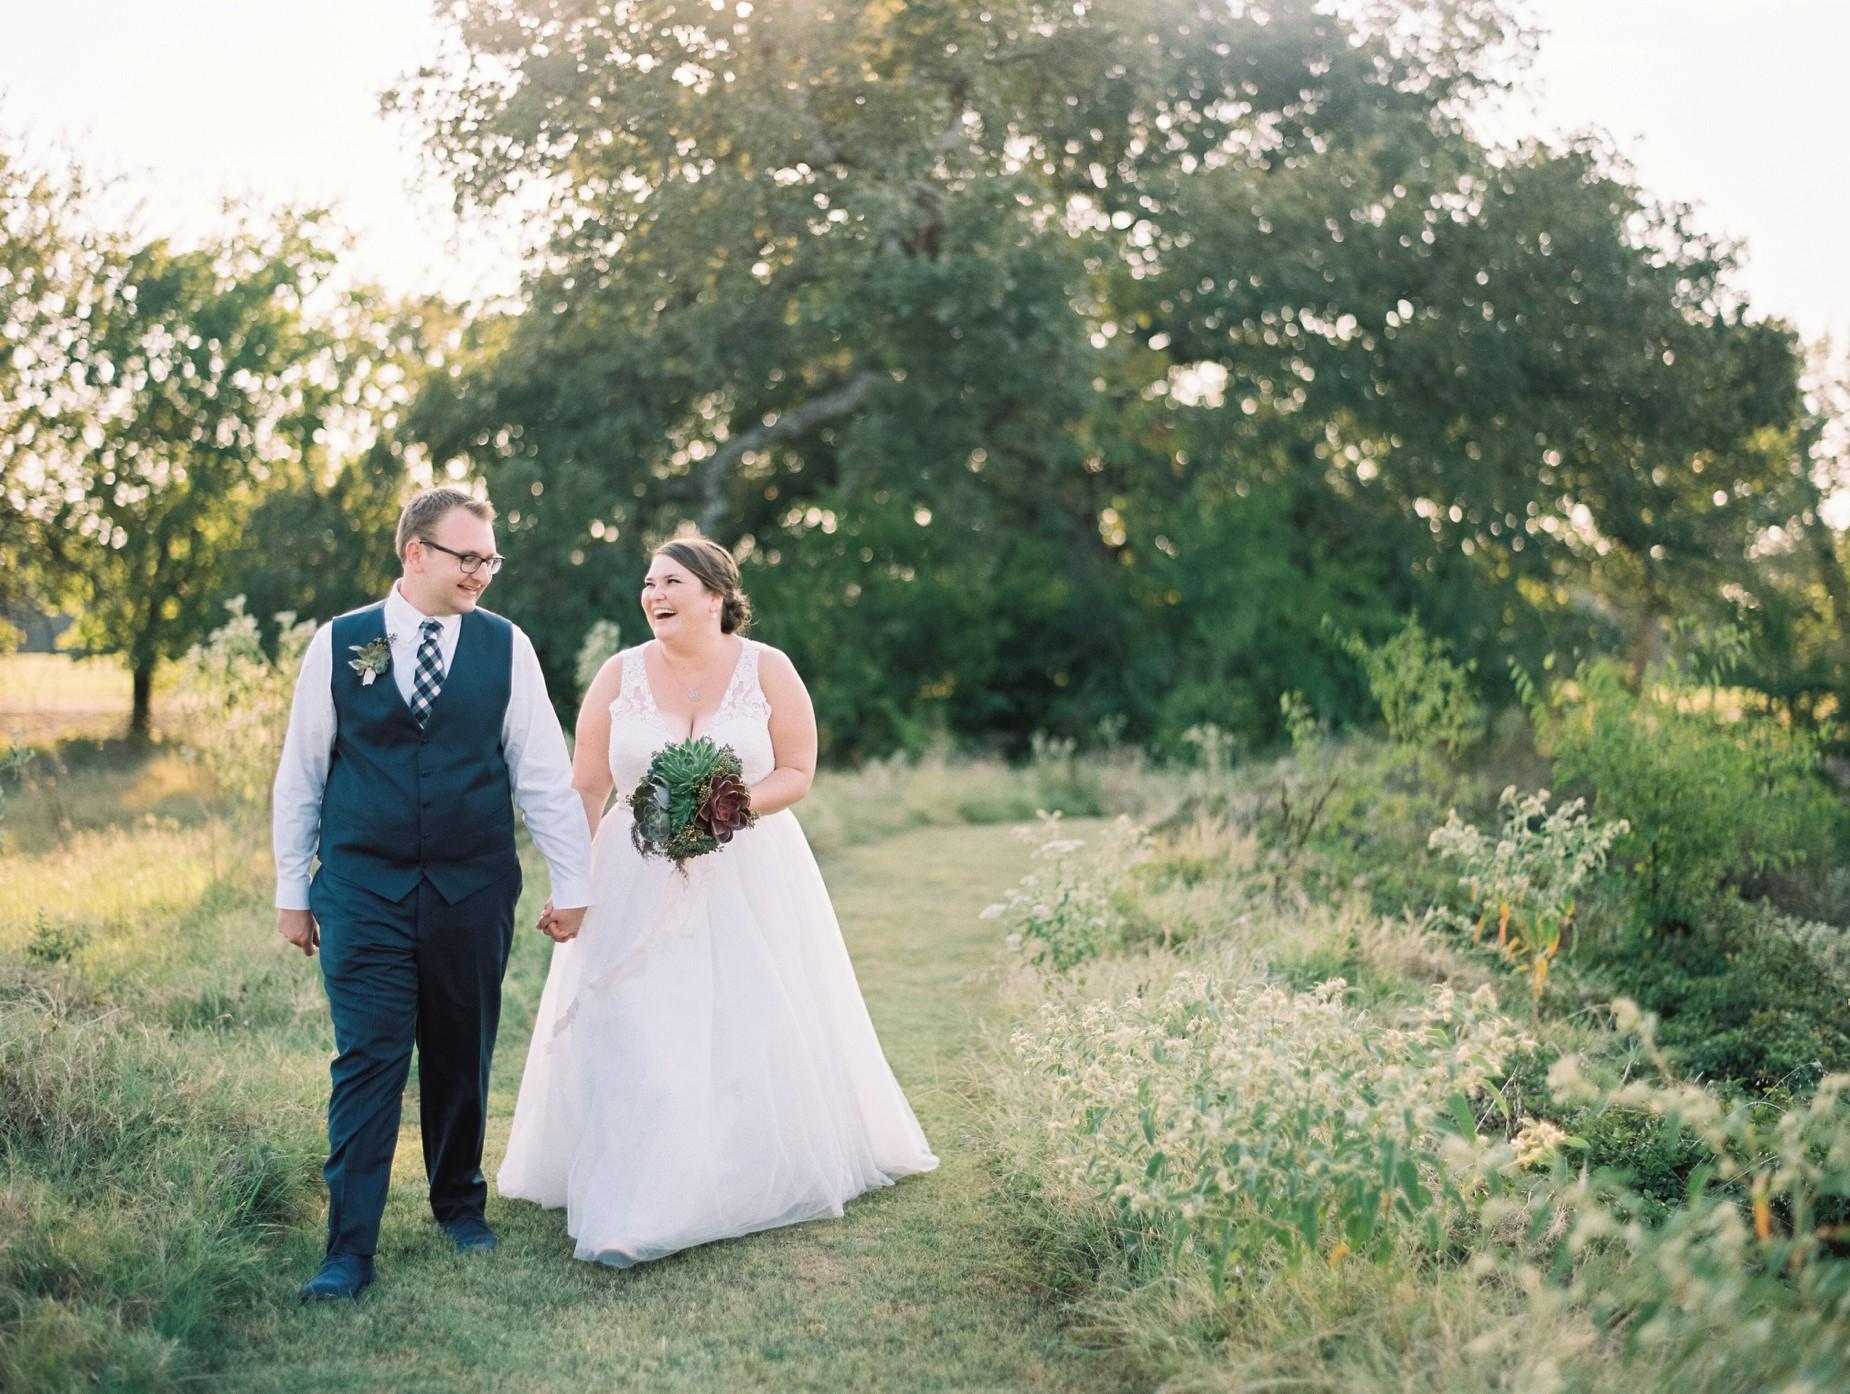 Becca Lea Photography- Dallas Fine Art film wedding photographer